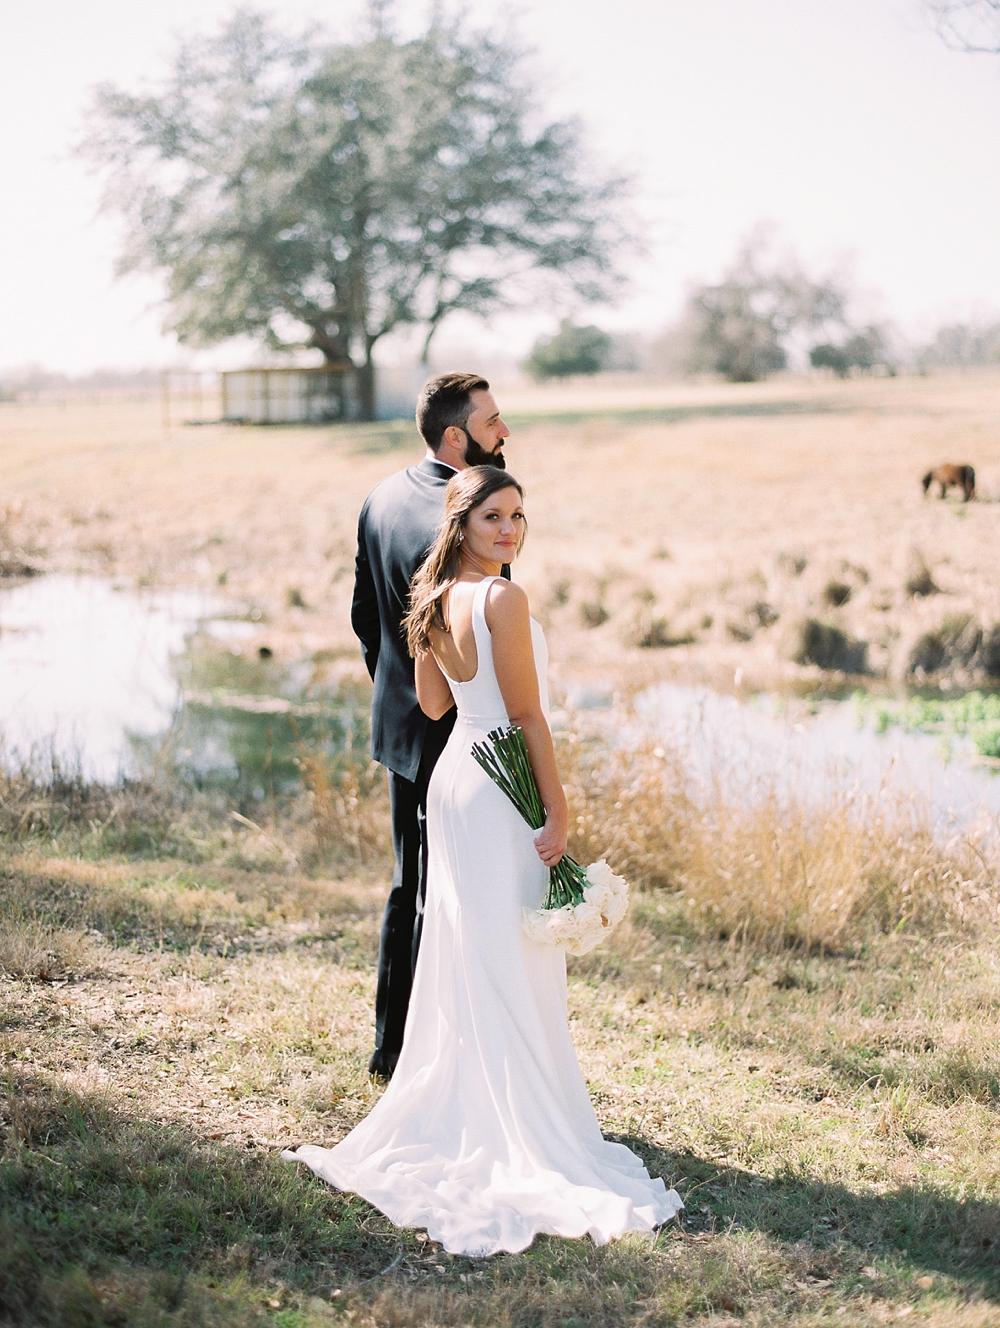 Kristin-La-Voie-Photography-austin-houston-texas-wedding-photographer-the-oaks-at-high-hill -288